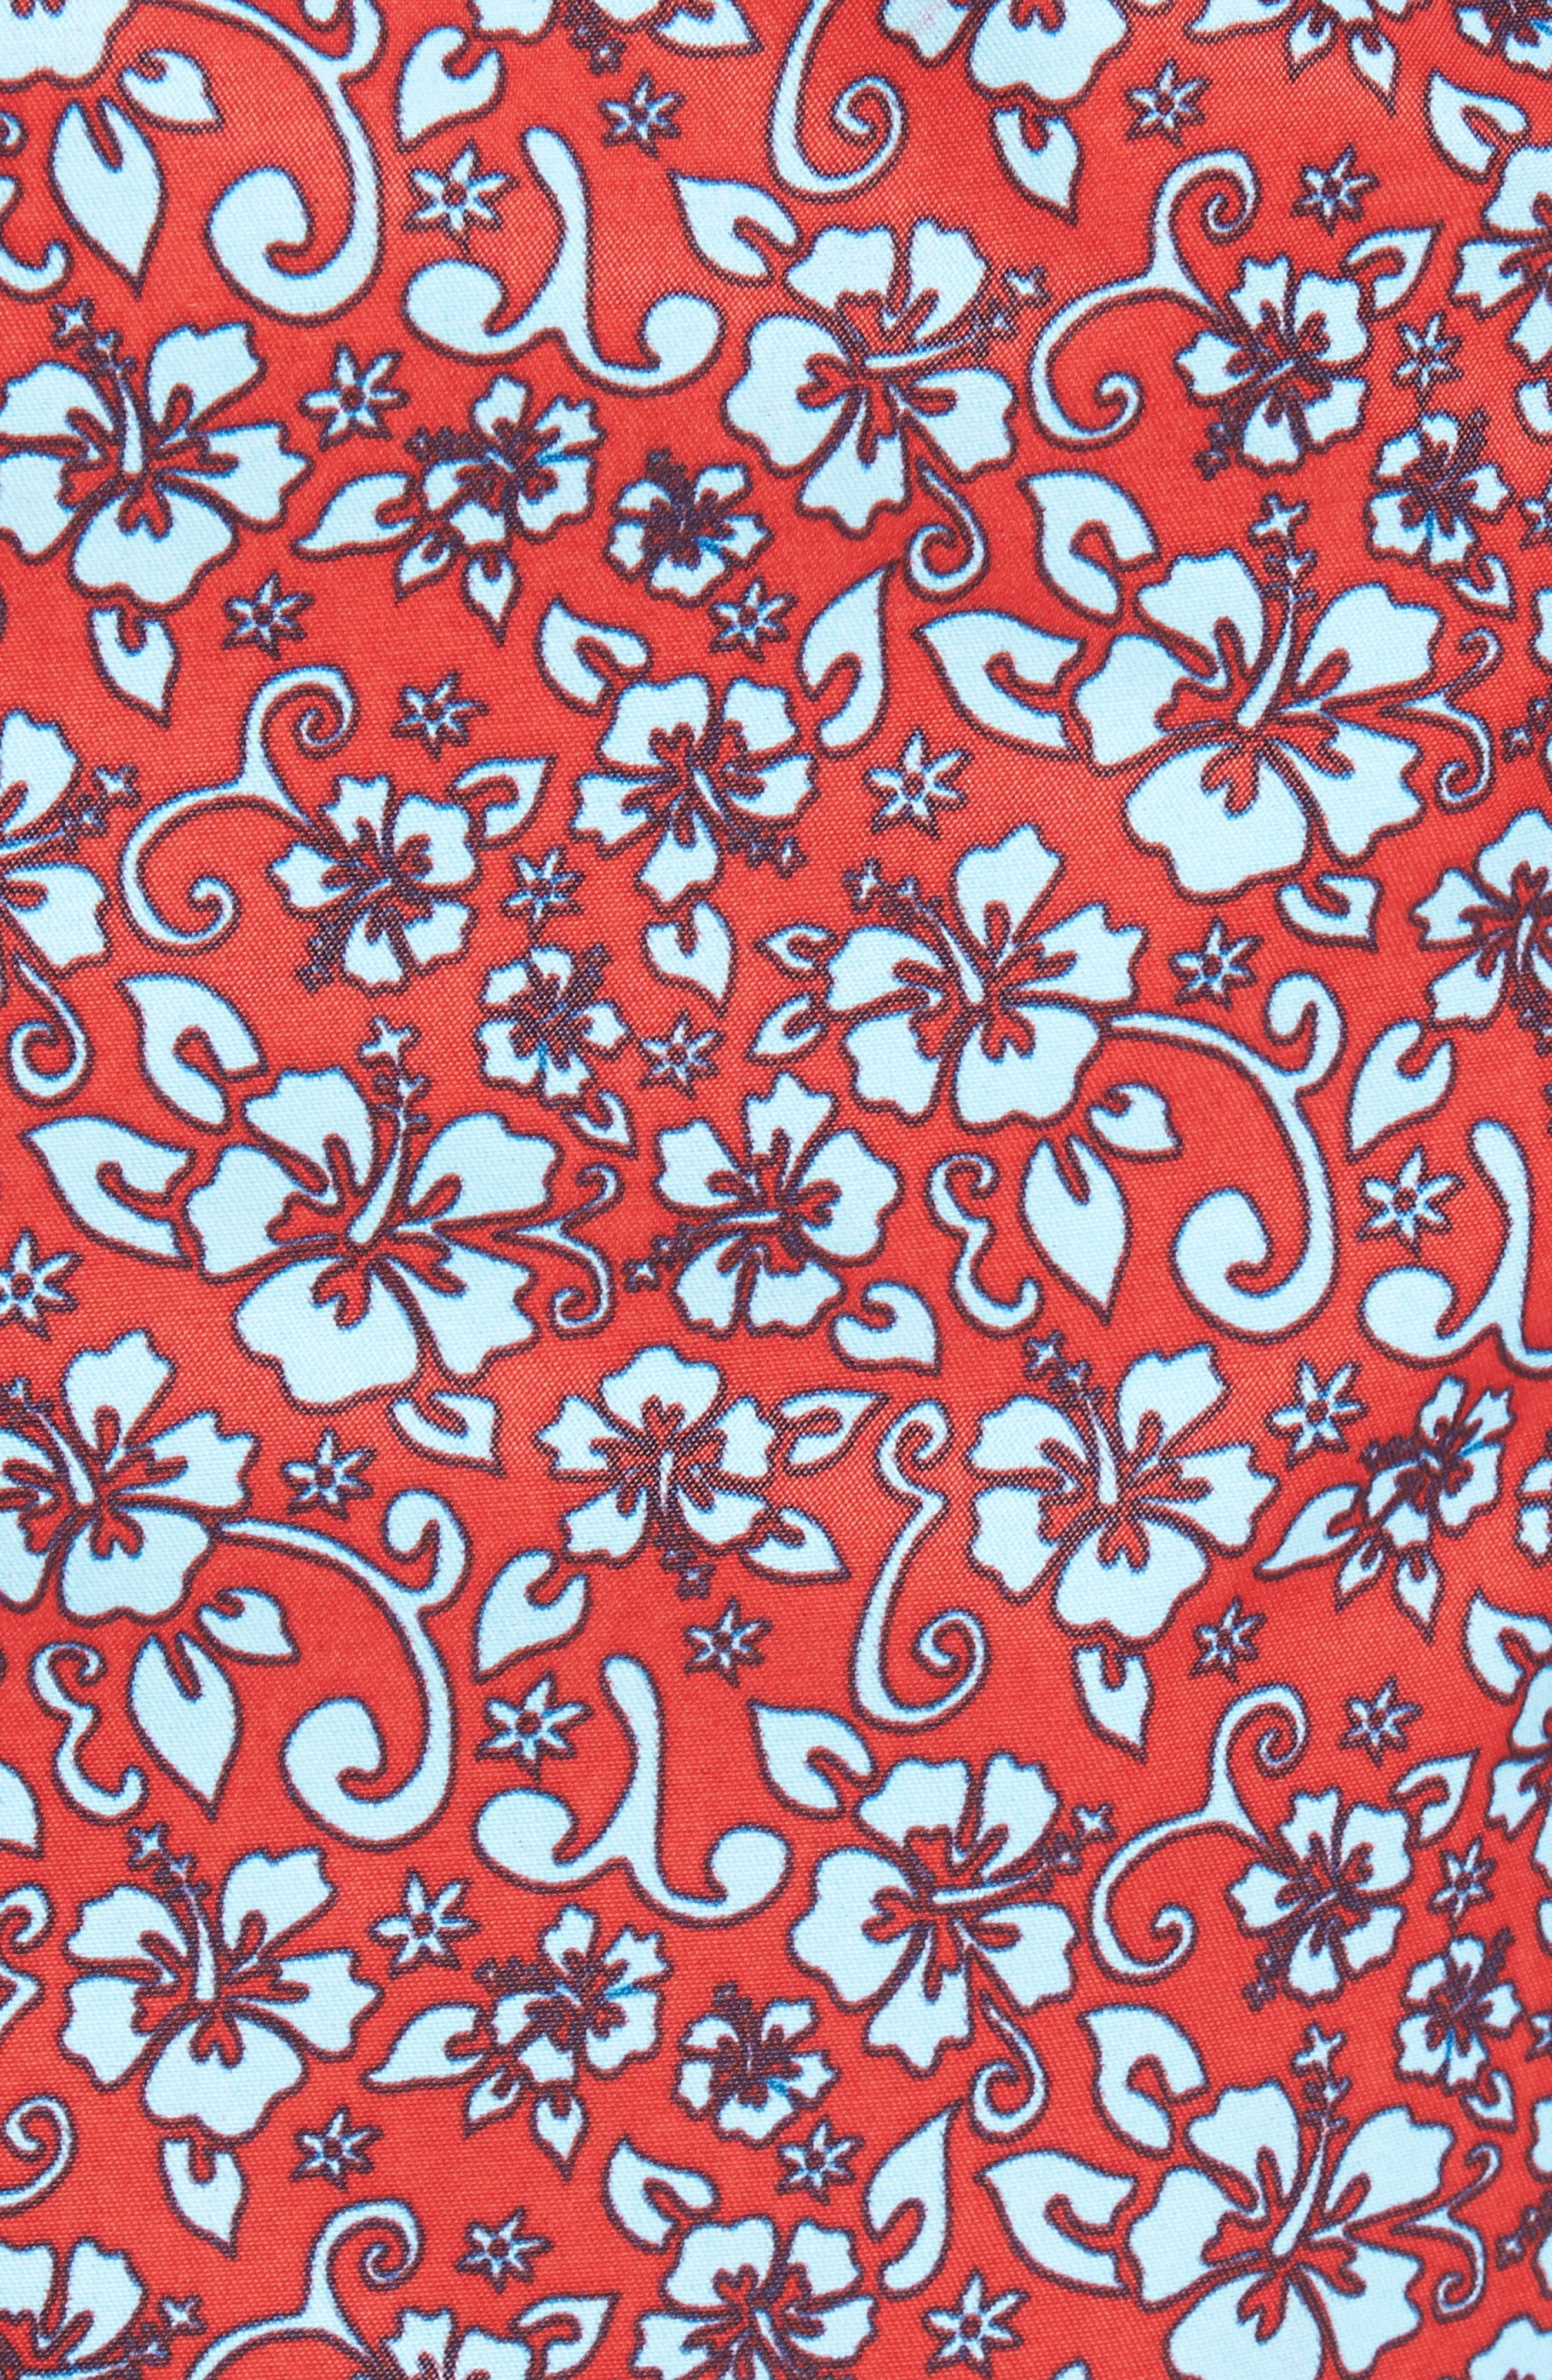 Mr. Swim Trim Fit Floral Swim Trunks,                             Alternate thumbnail 5, color,                             600